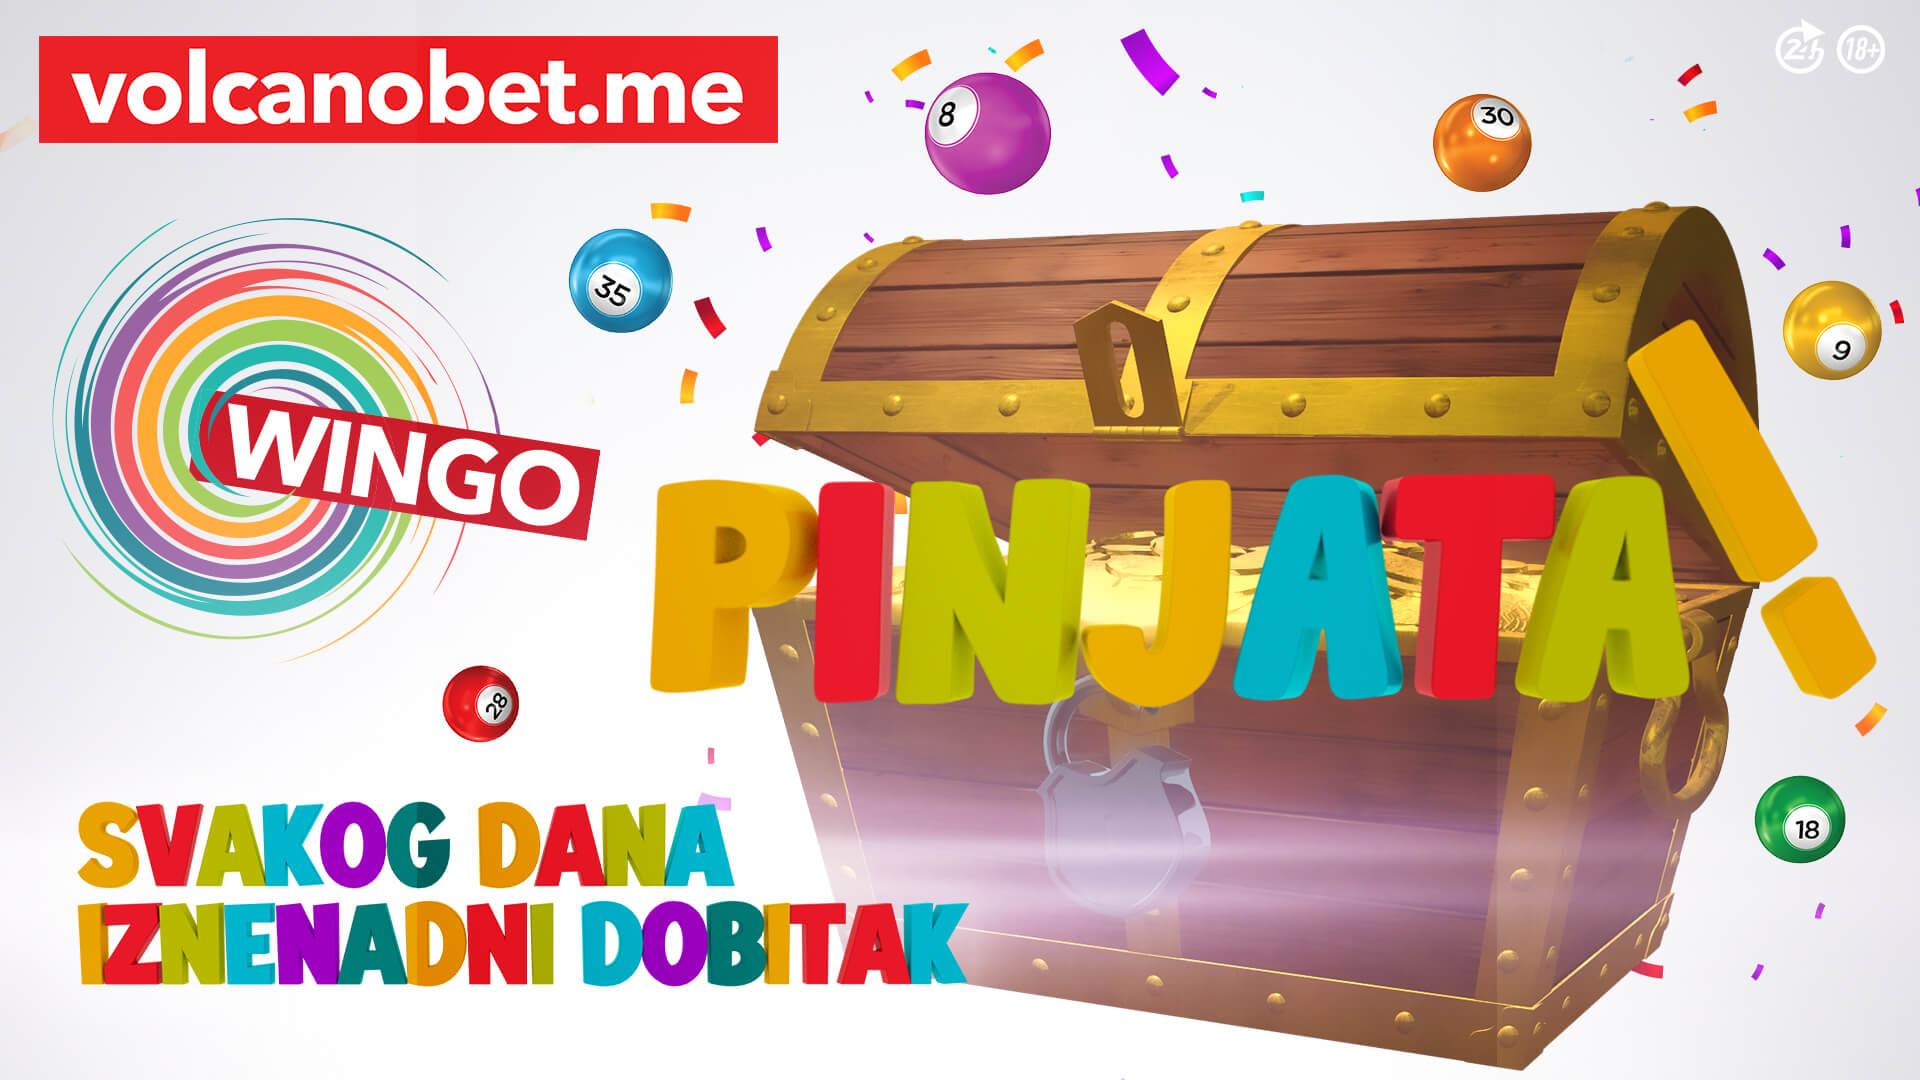 Wingo Pinjata